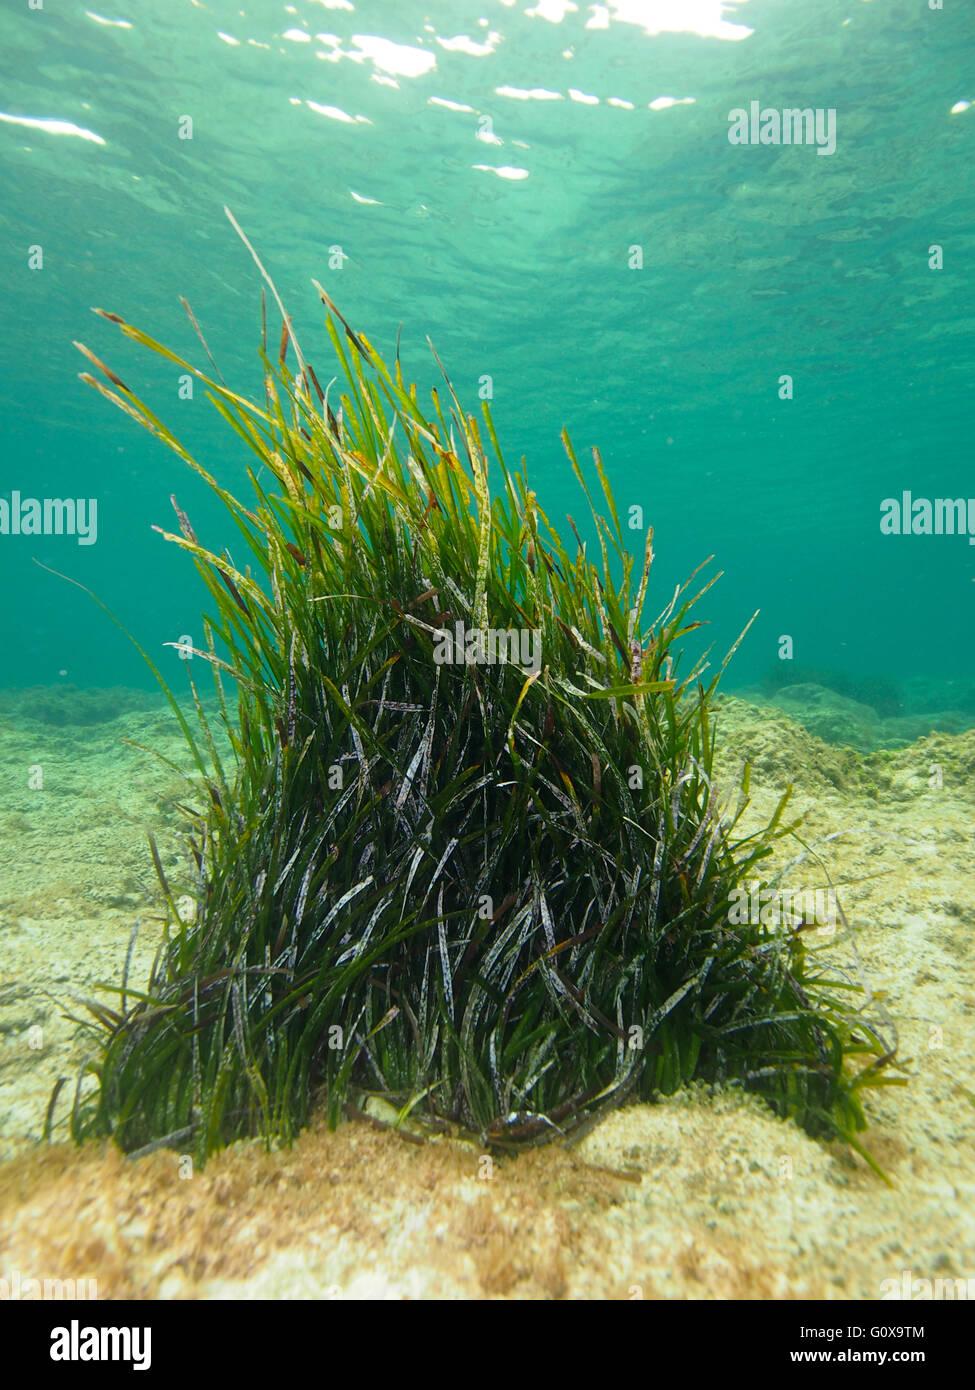 Seagrass underwater in Cyprus,Mediterranean Sea - Stock Image